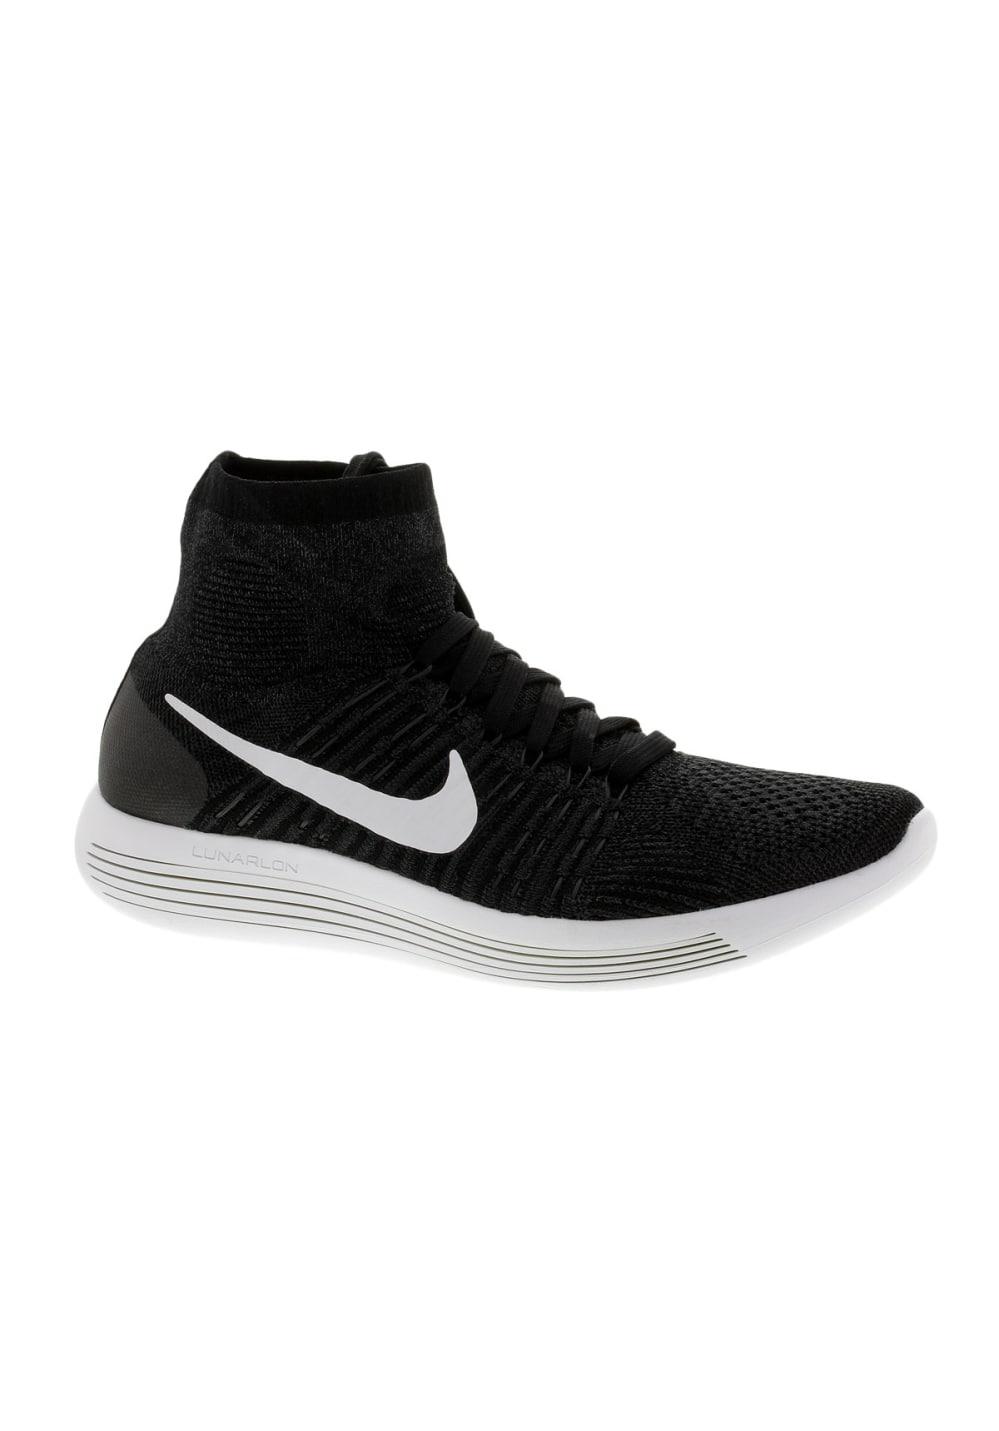 Nike Flyknit Lunarepic Running Shoe - Laufschuh...